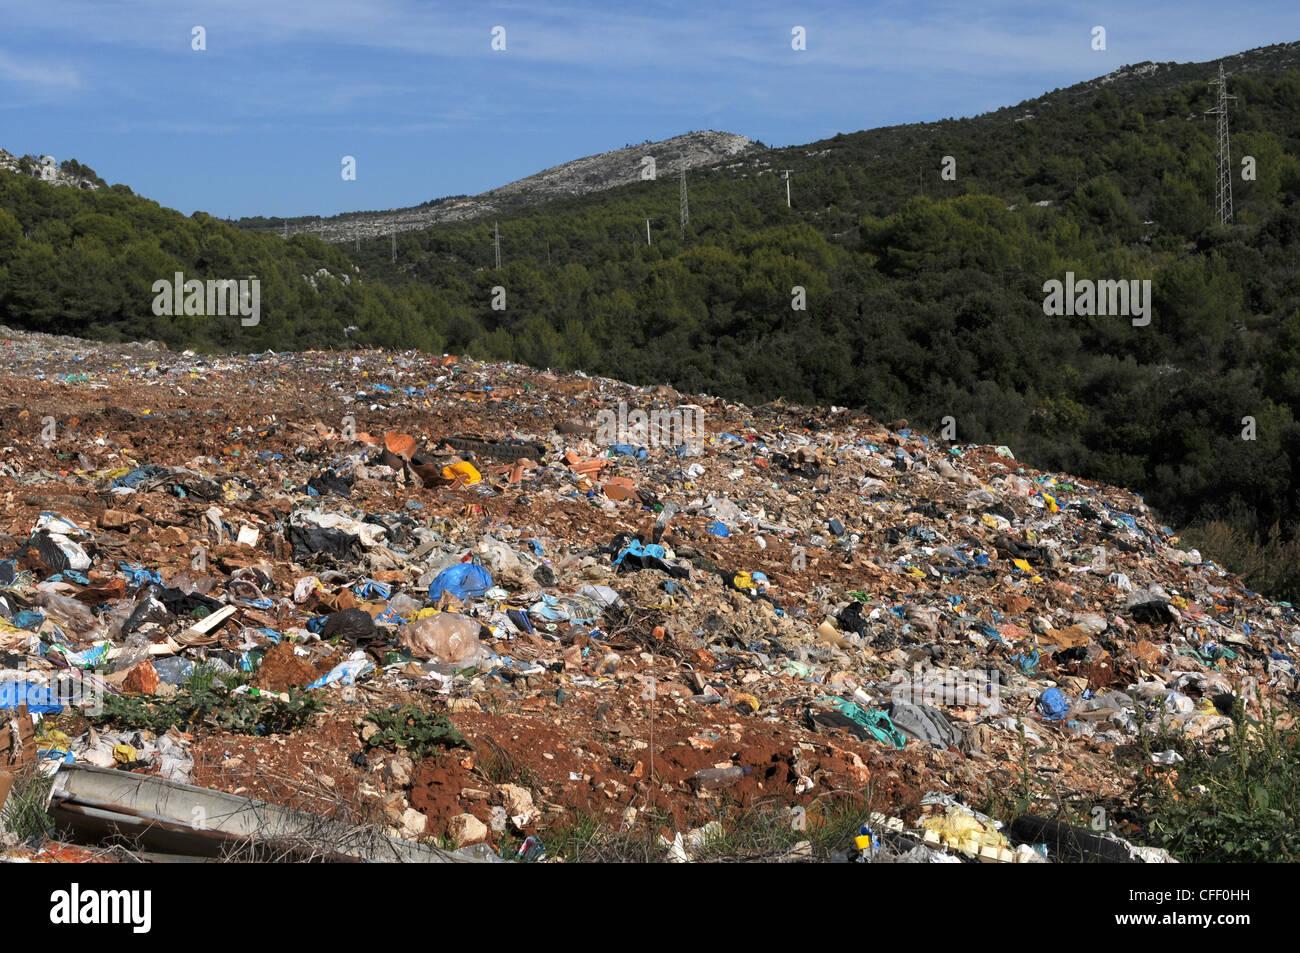 Garbage dump in Hvar, Croatia - Stock Image